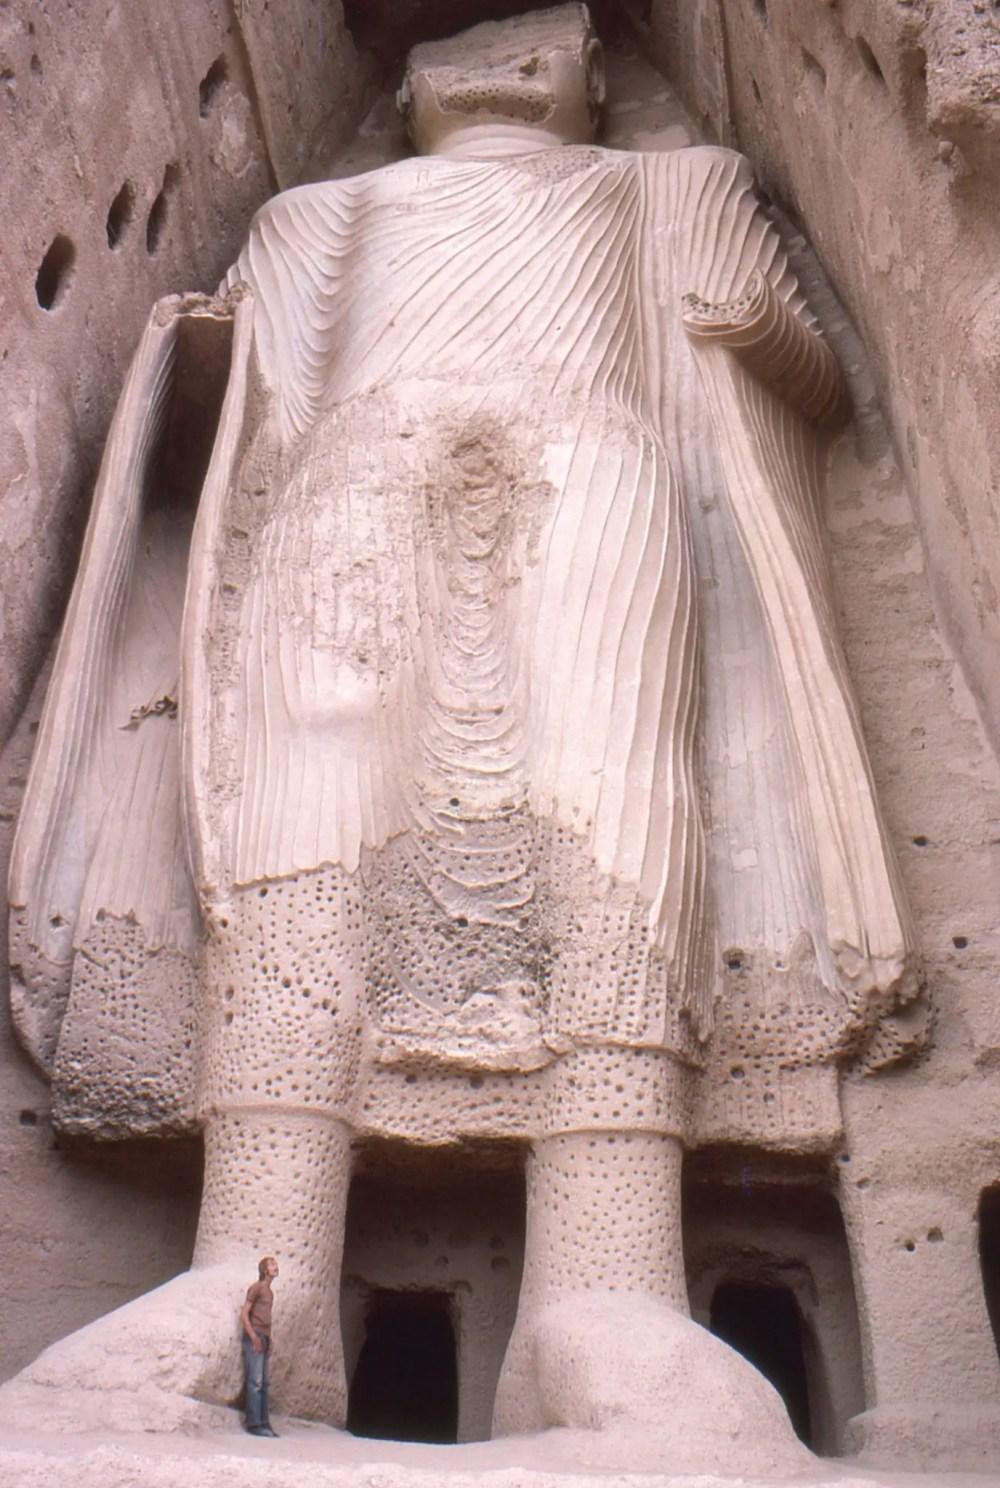 budas-de-bamiyan-by-phecda109-own-work-public-domain